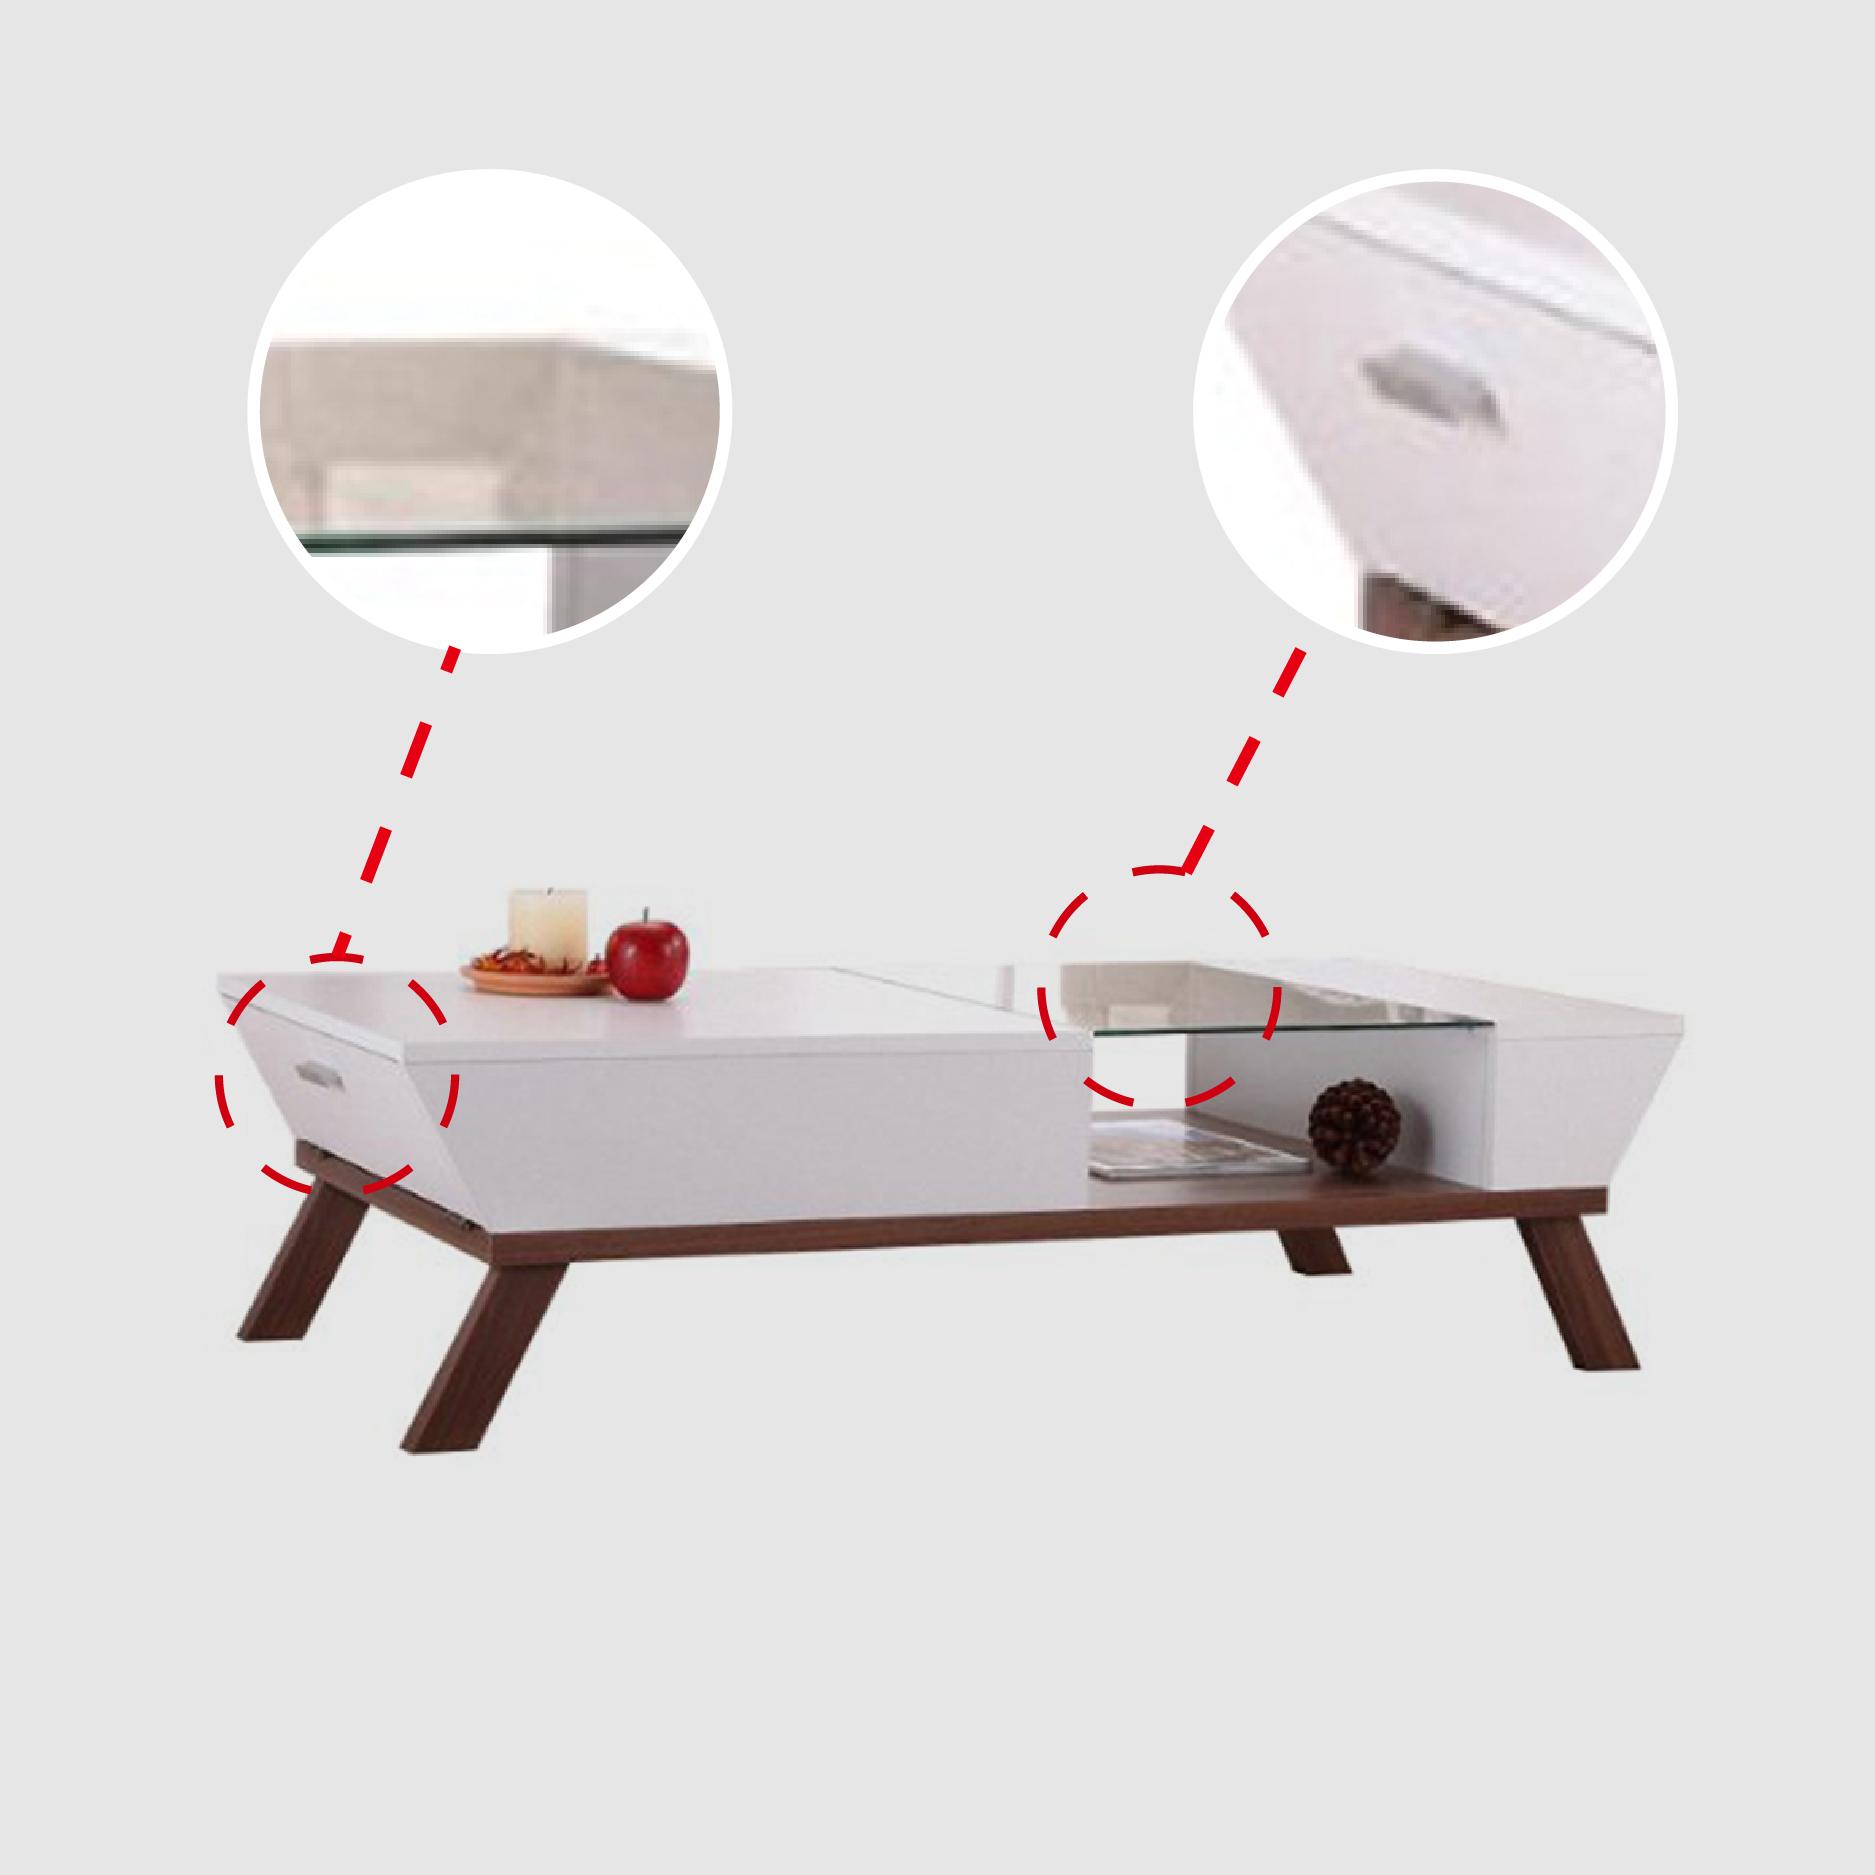 table basse moderne fabricants de meubles de maison slicethinner. Black Bedroom Furniture Sets. Home Design Ideas